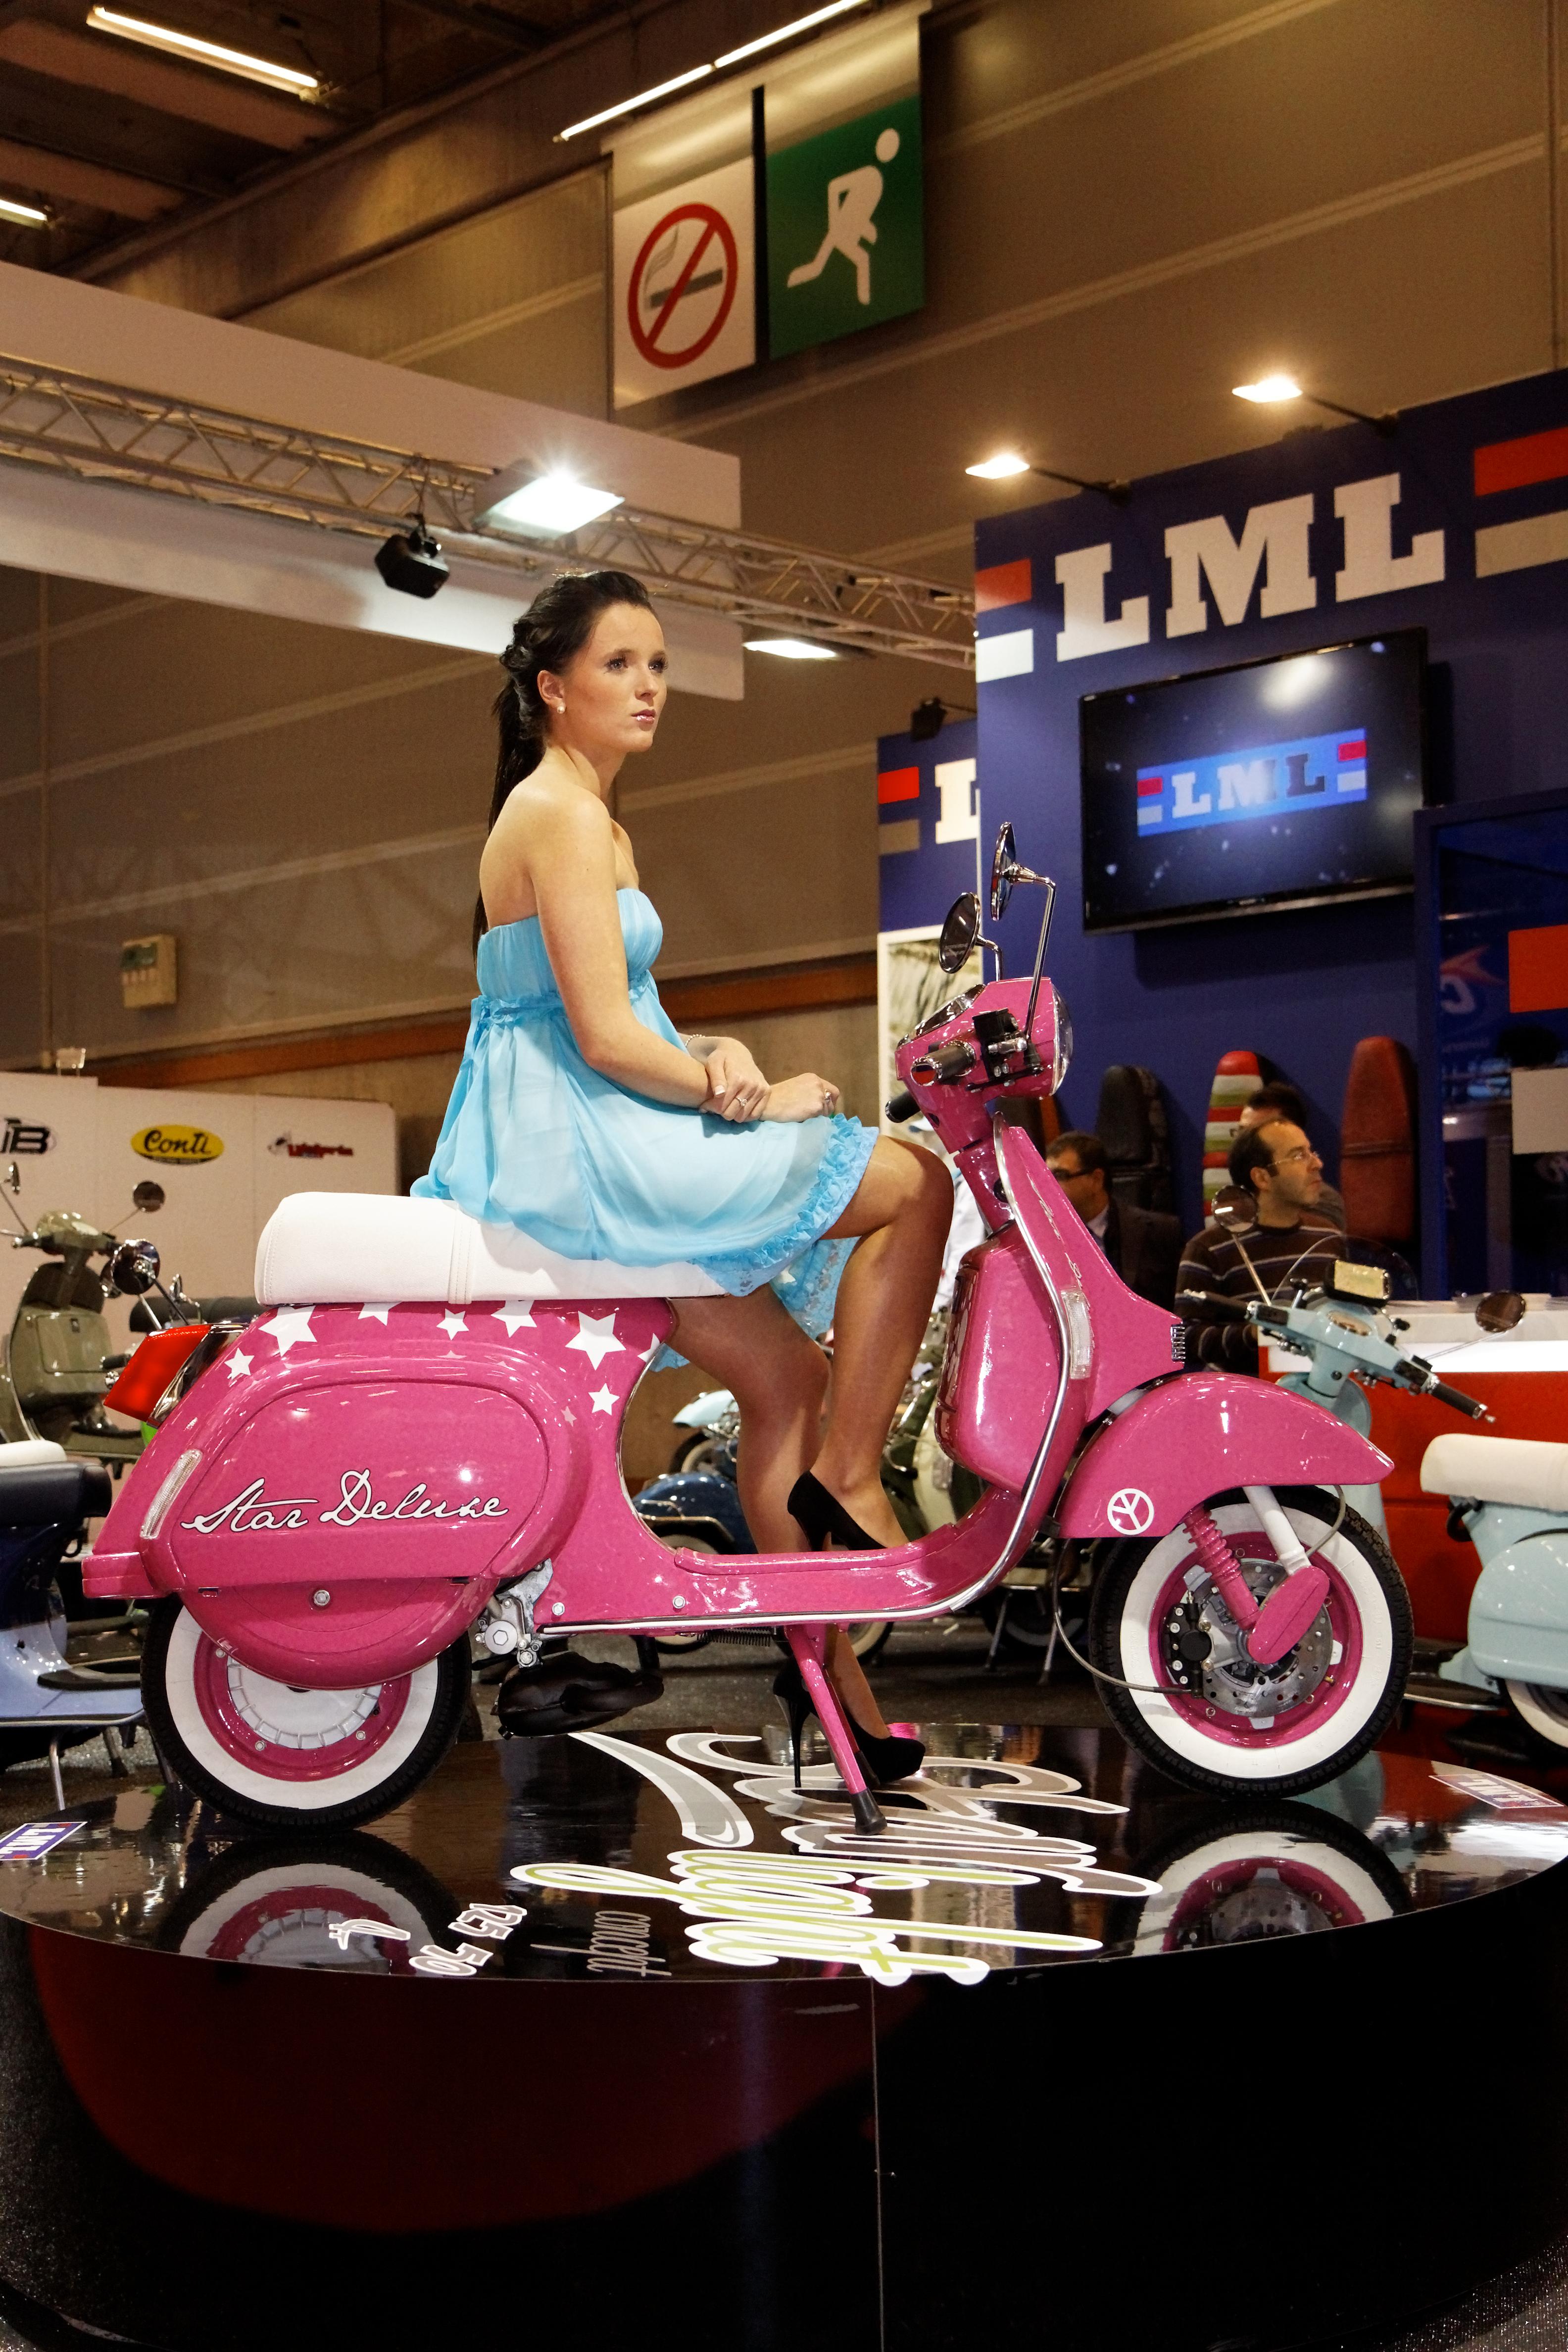 File:Paris - Salon de la moto 2011 - LML - Star Deluxe - 002 ...